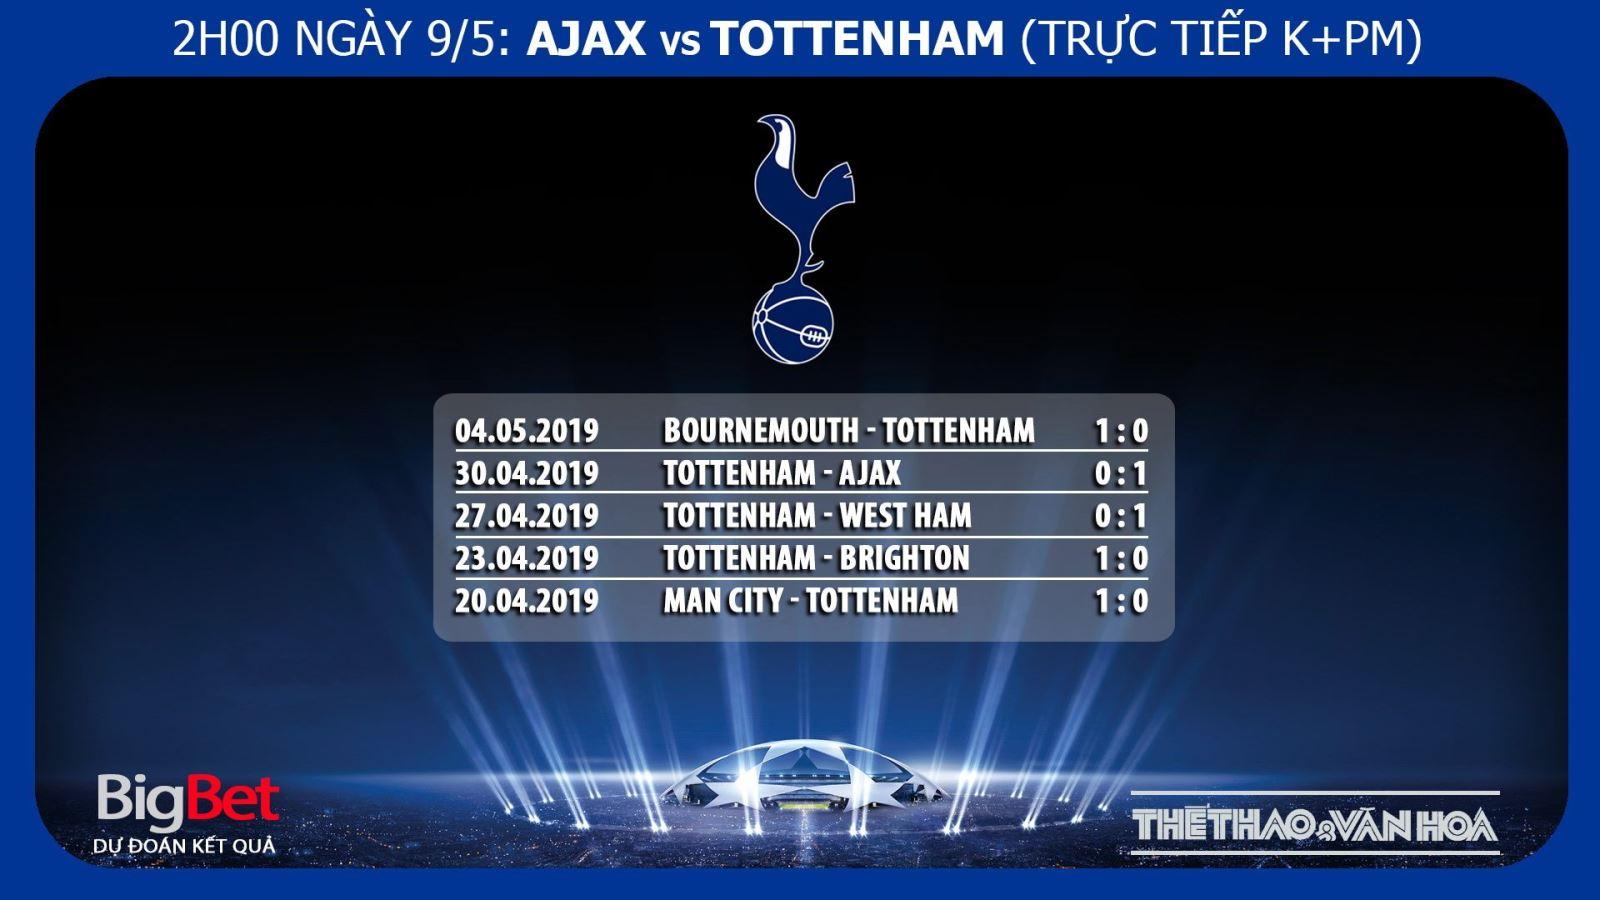 Ajax, Tottenham, Ajax vs Tottenham, soi kèo Ajax vs Tottenham, kèo Ajax vs Tottenham, kèo Tottenham, kèo Ajax, trực tiếp Tottenham vs Ajax, cúp C1, truc tiep bong da